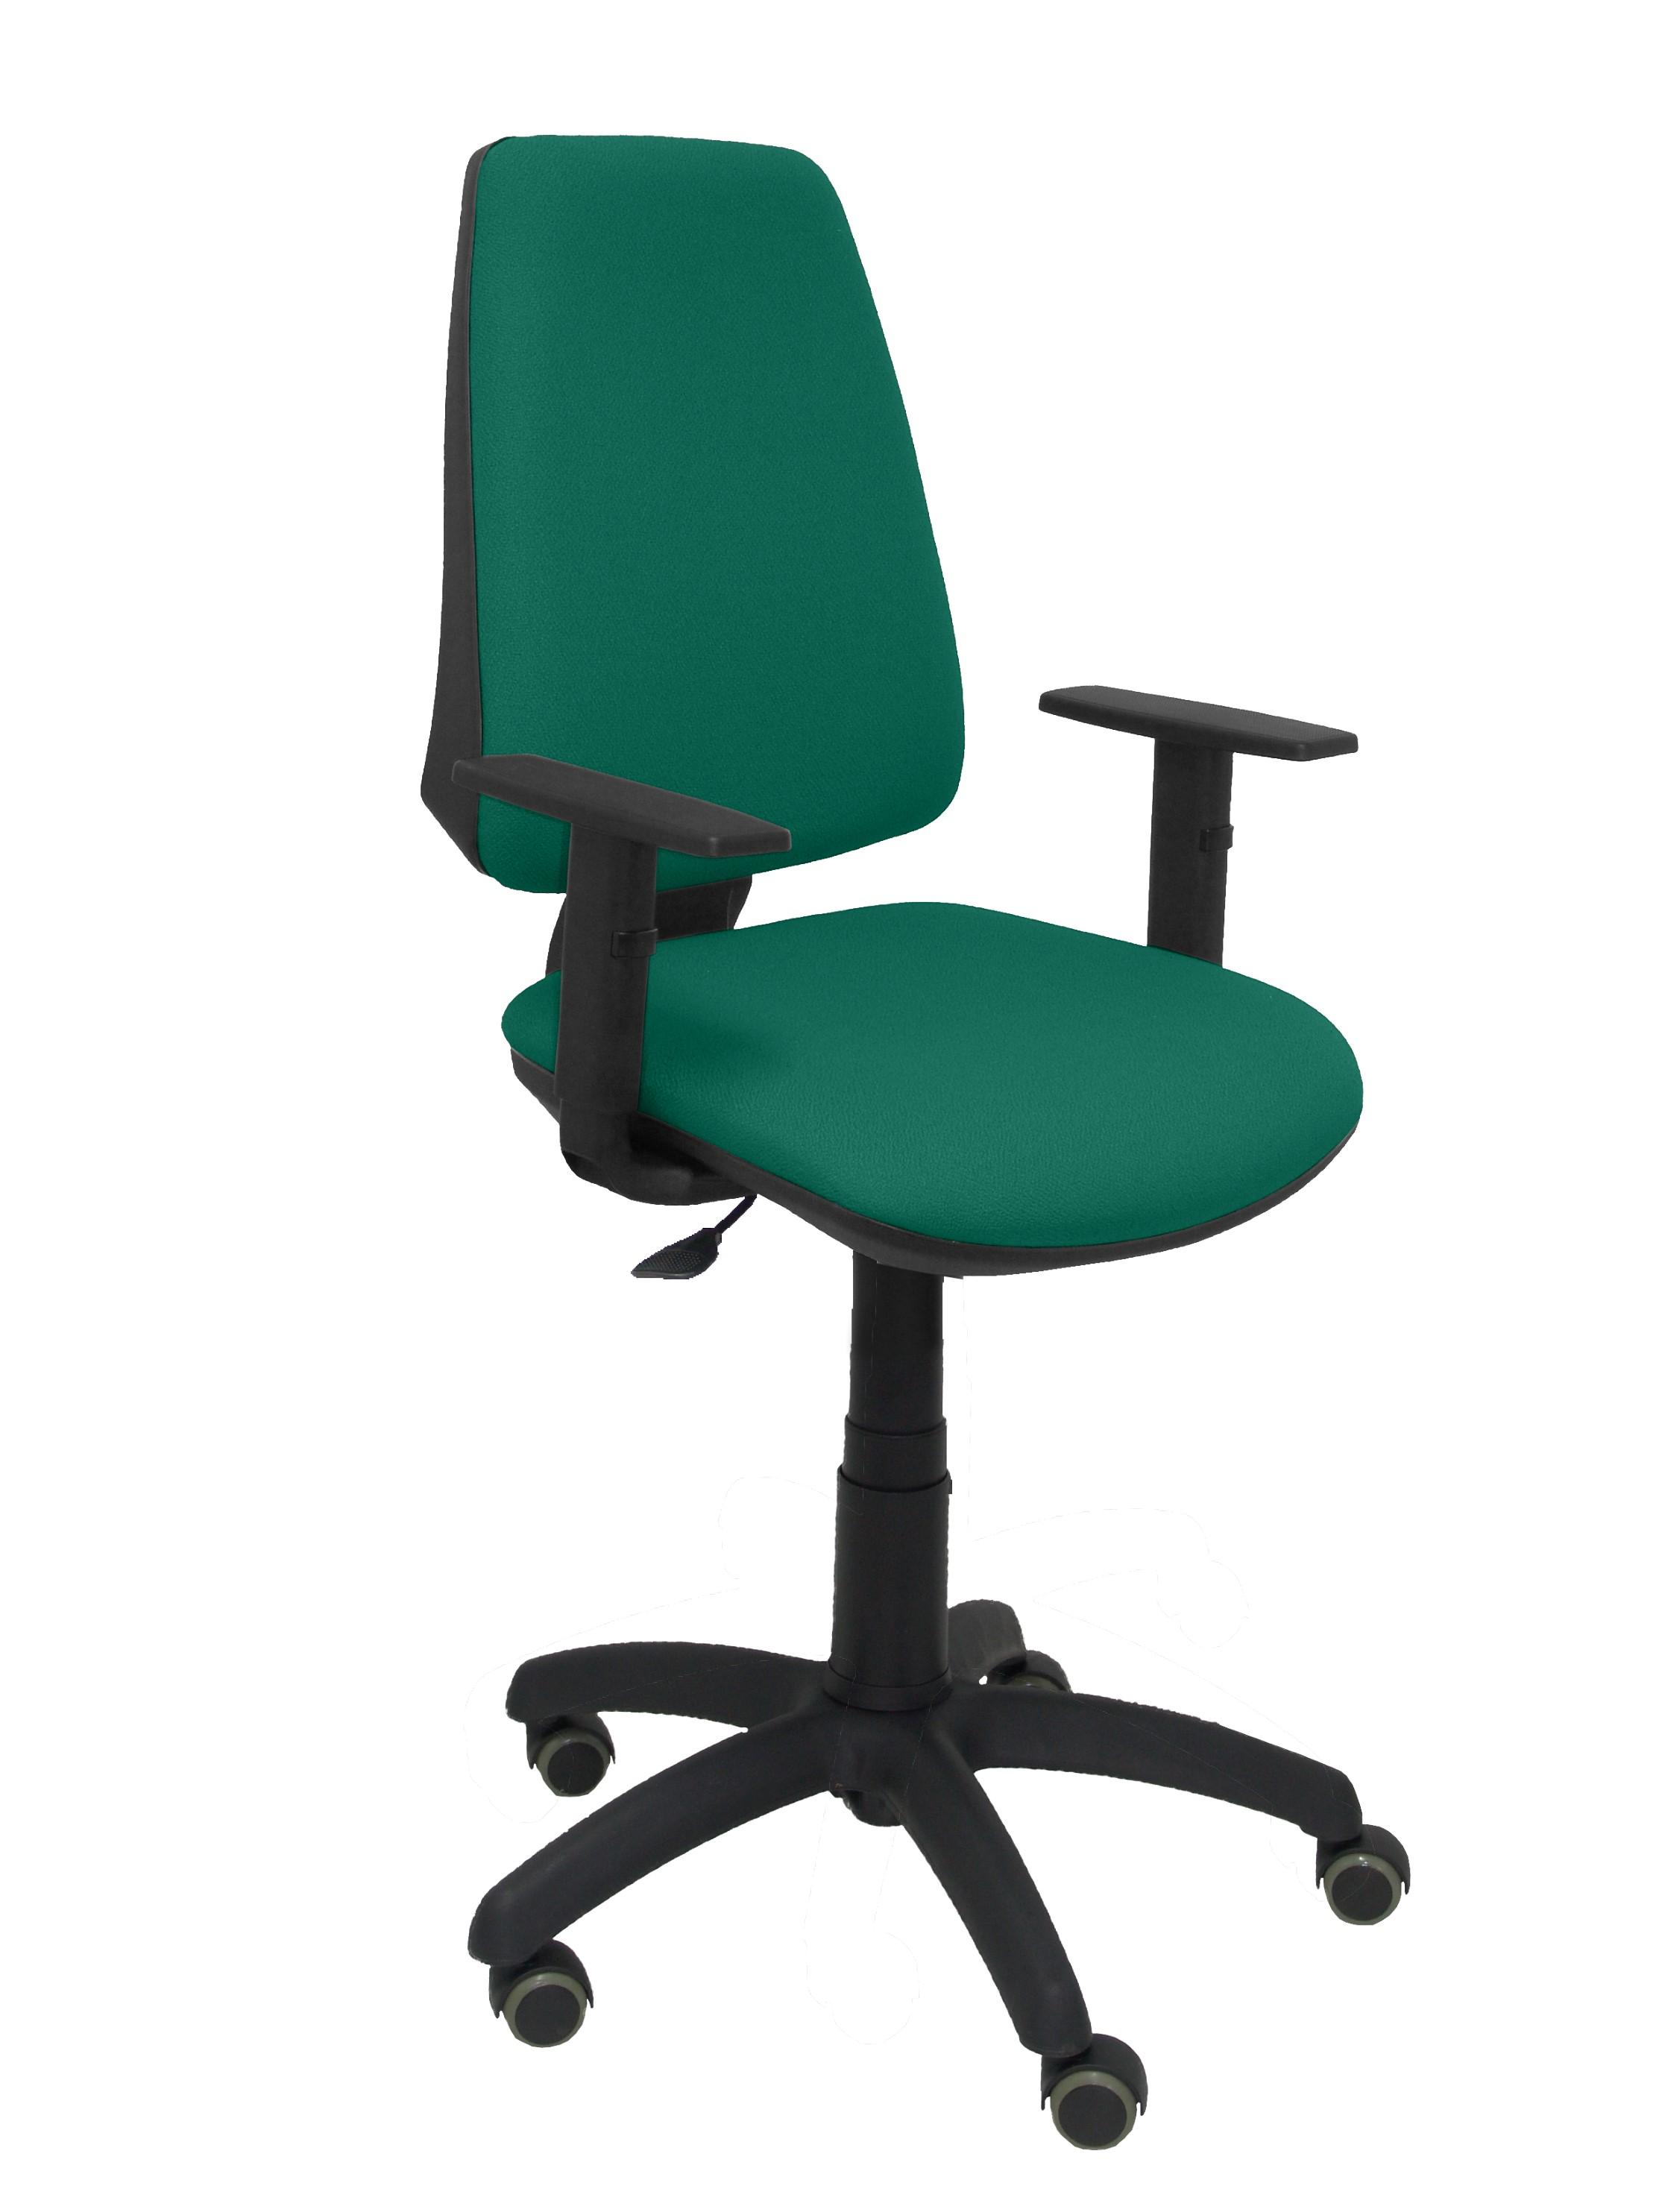 Silla Elche CP bali verde brazos regulables ruedas de parquet